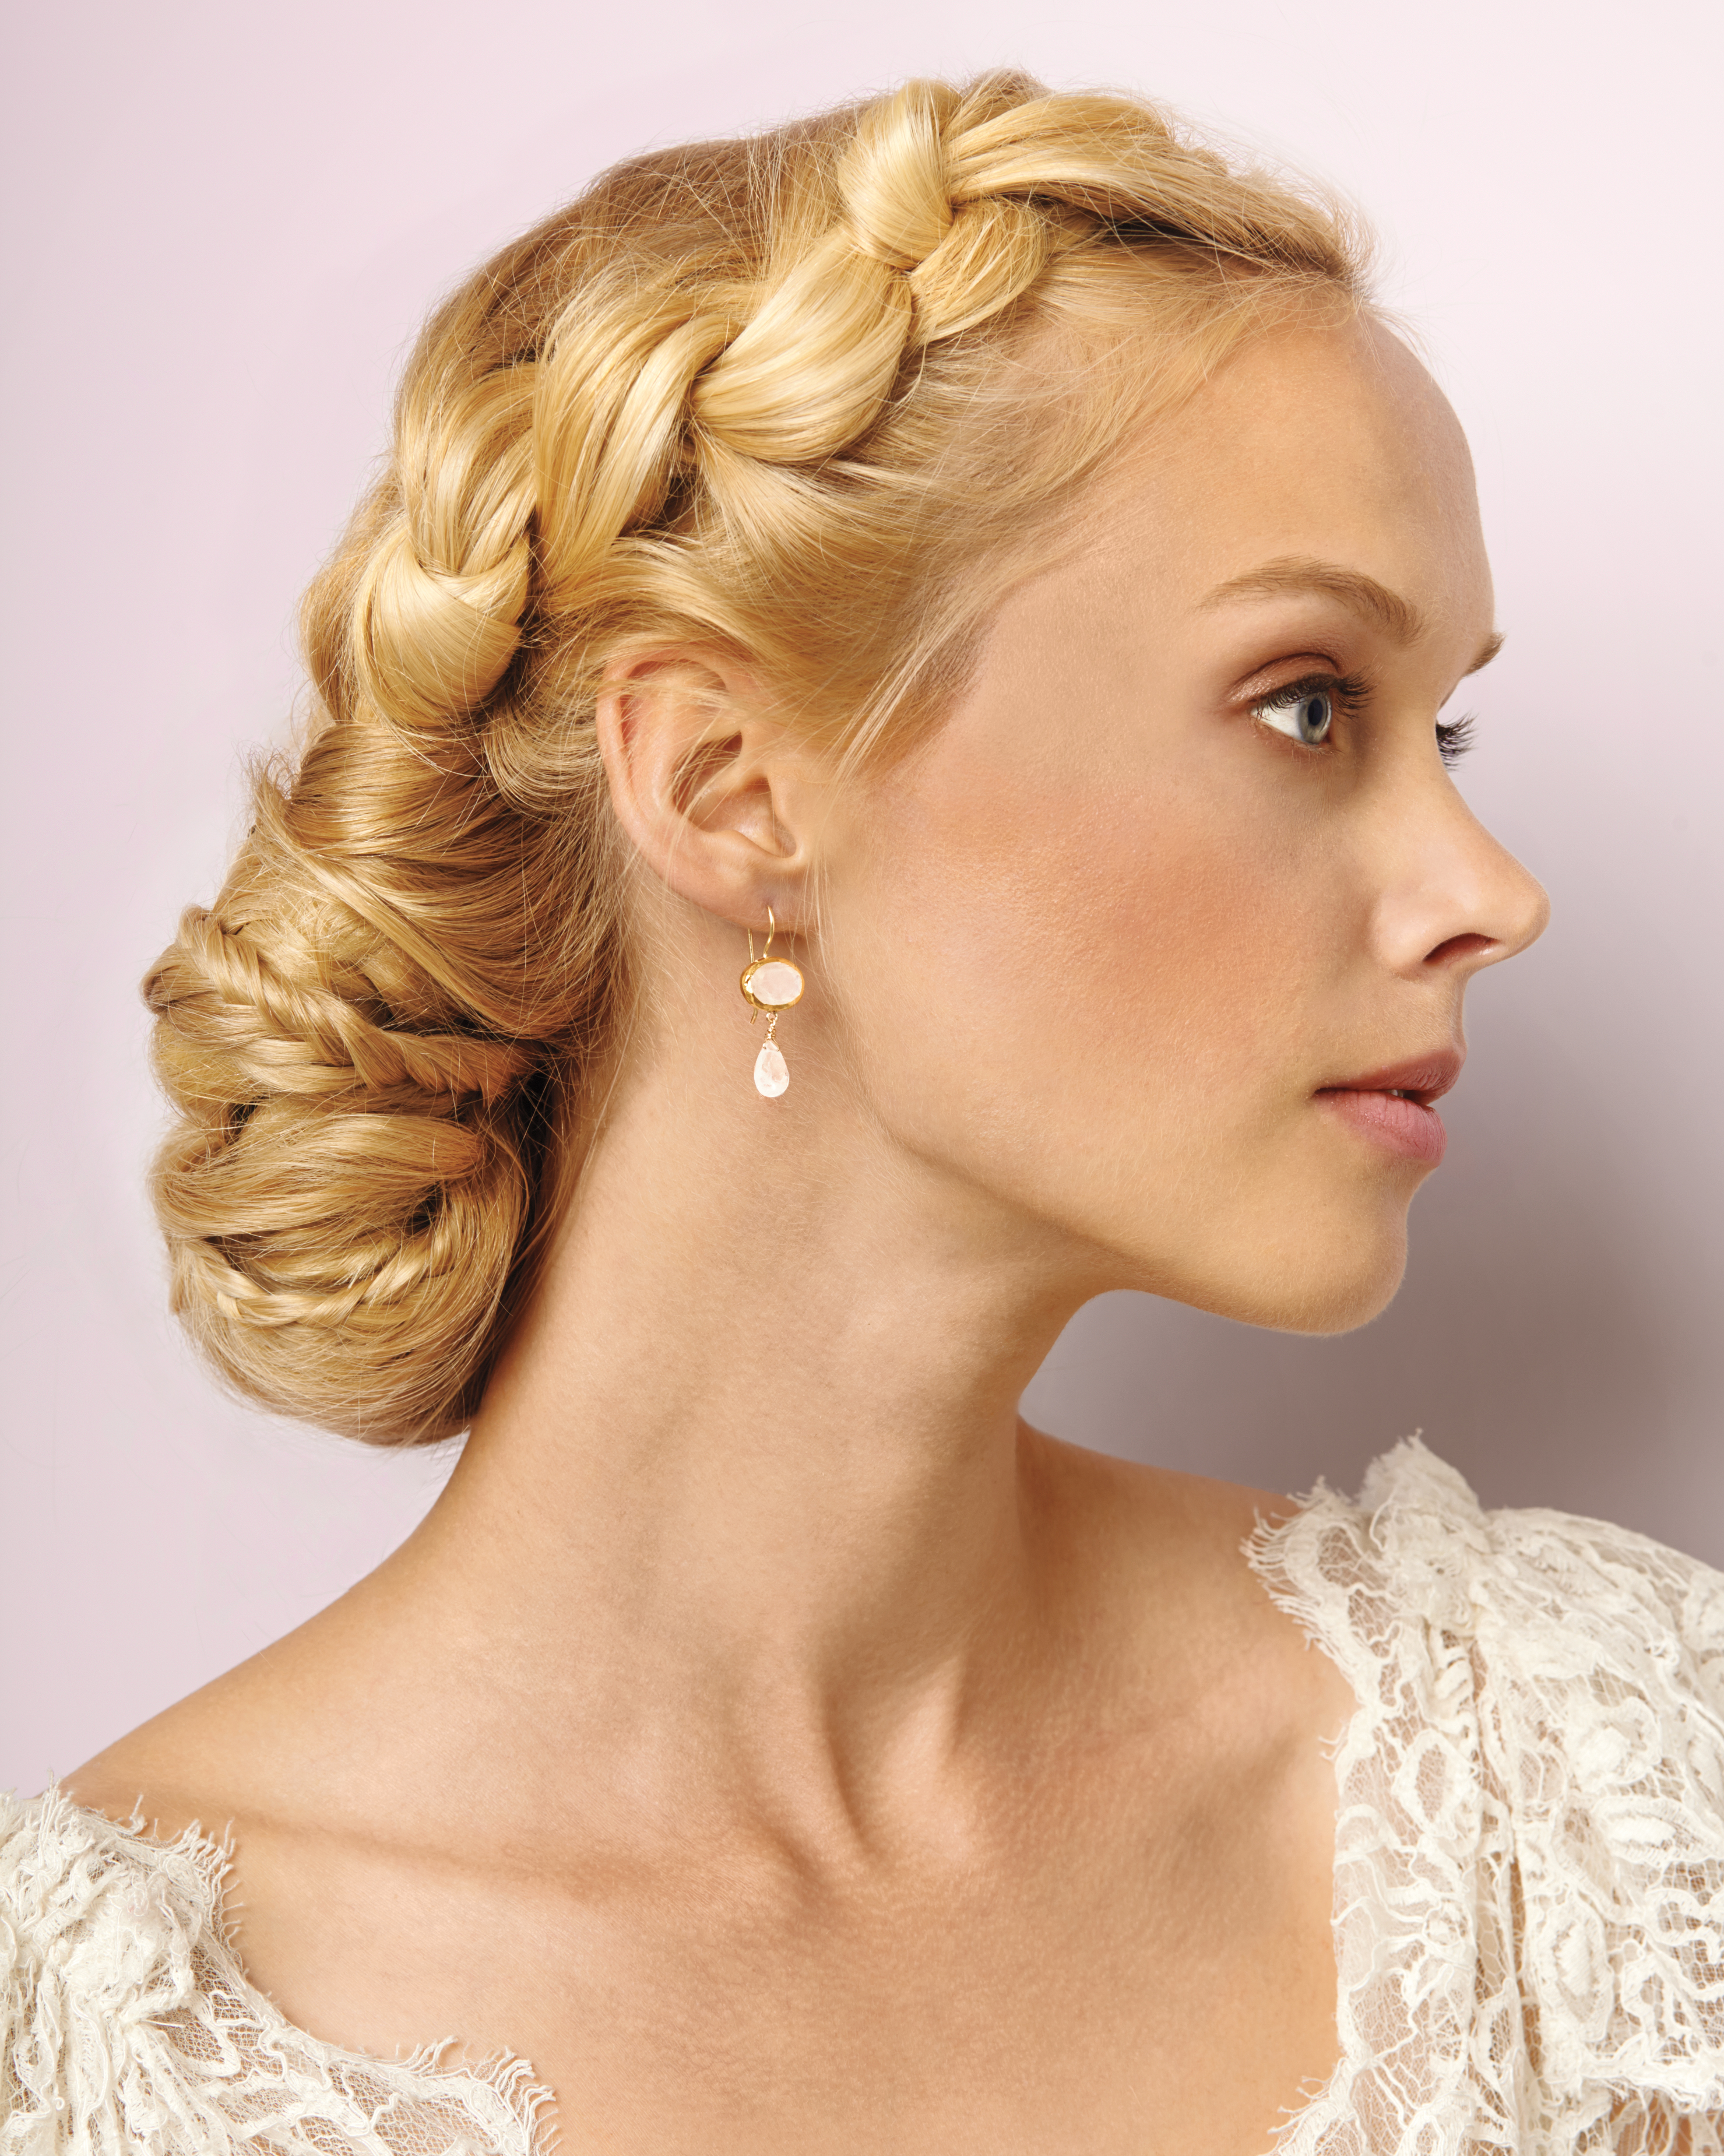 03-long-hair-blonde-braid-079-d111402.jpg